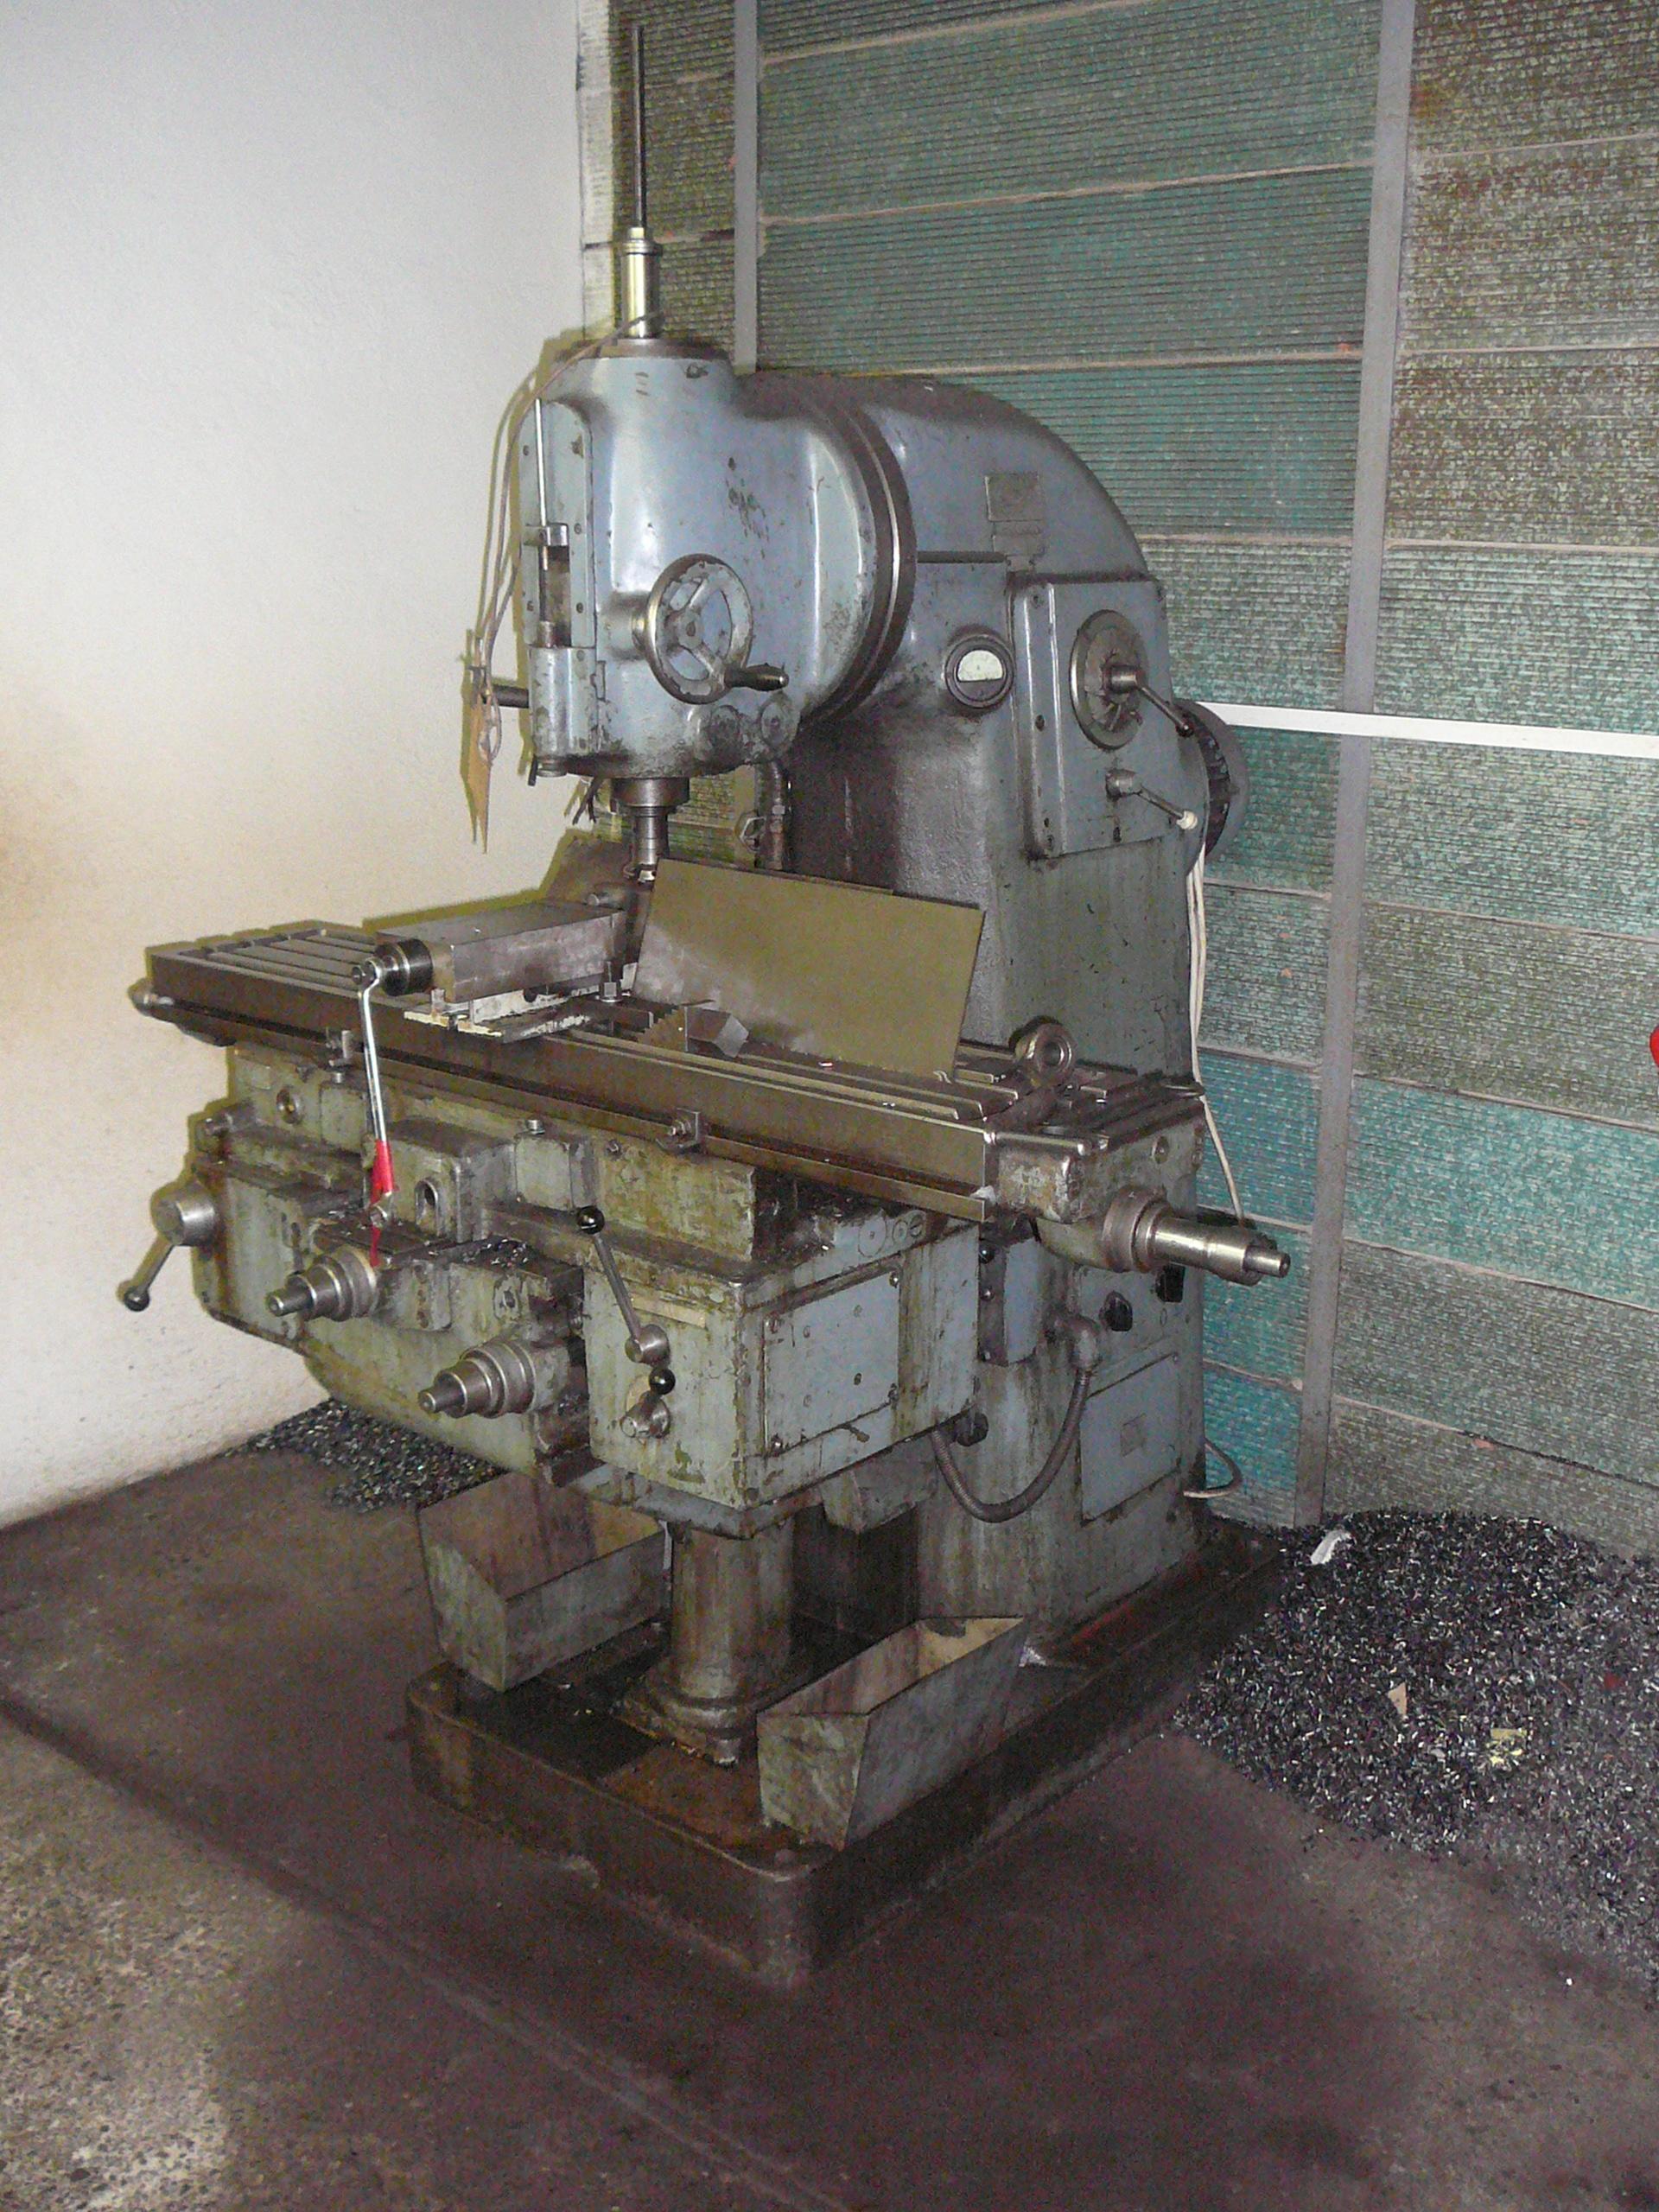 Using the milling machine